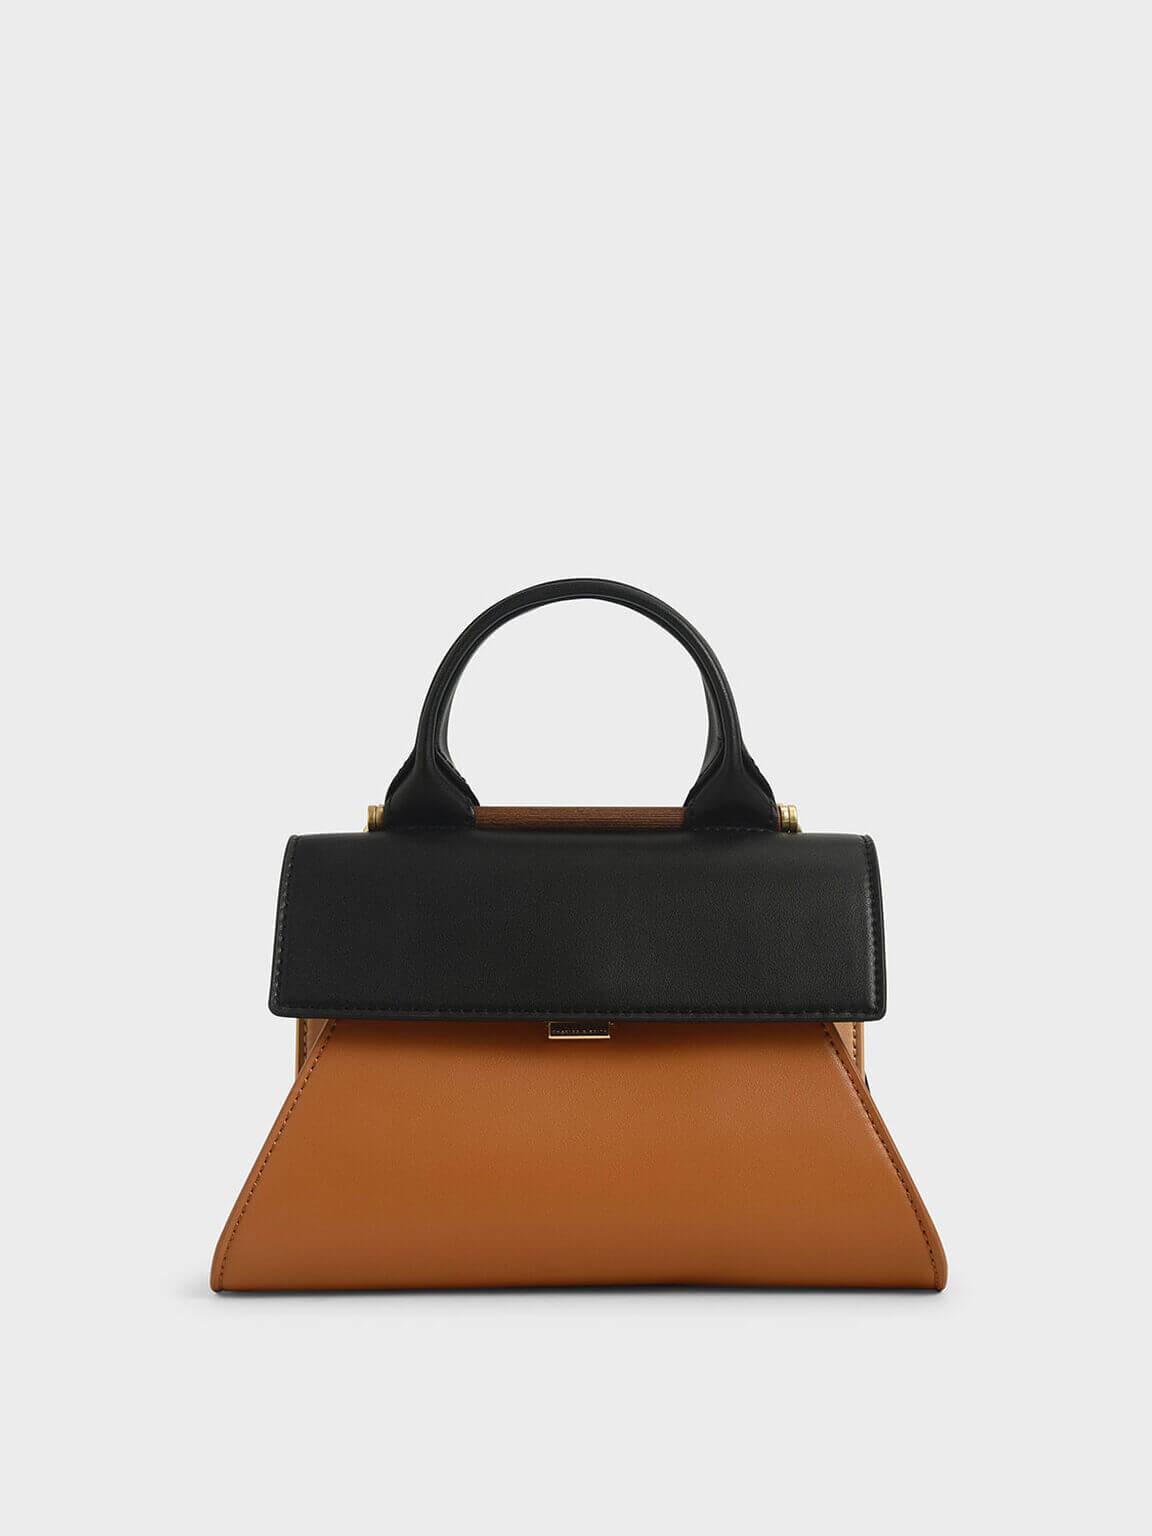 two-tone sculptural bag